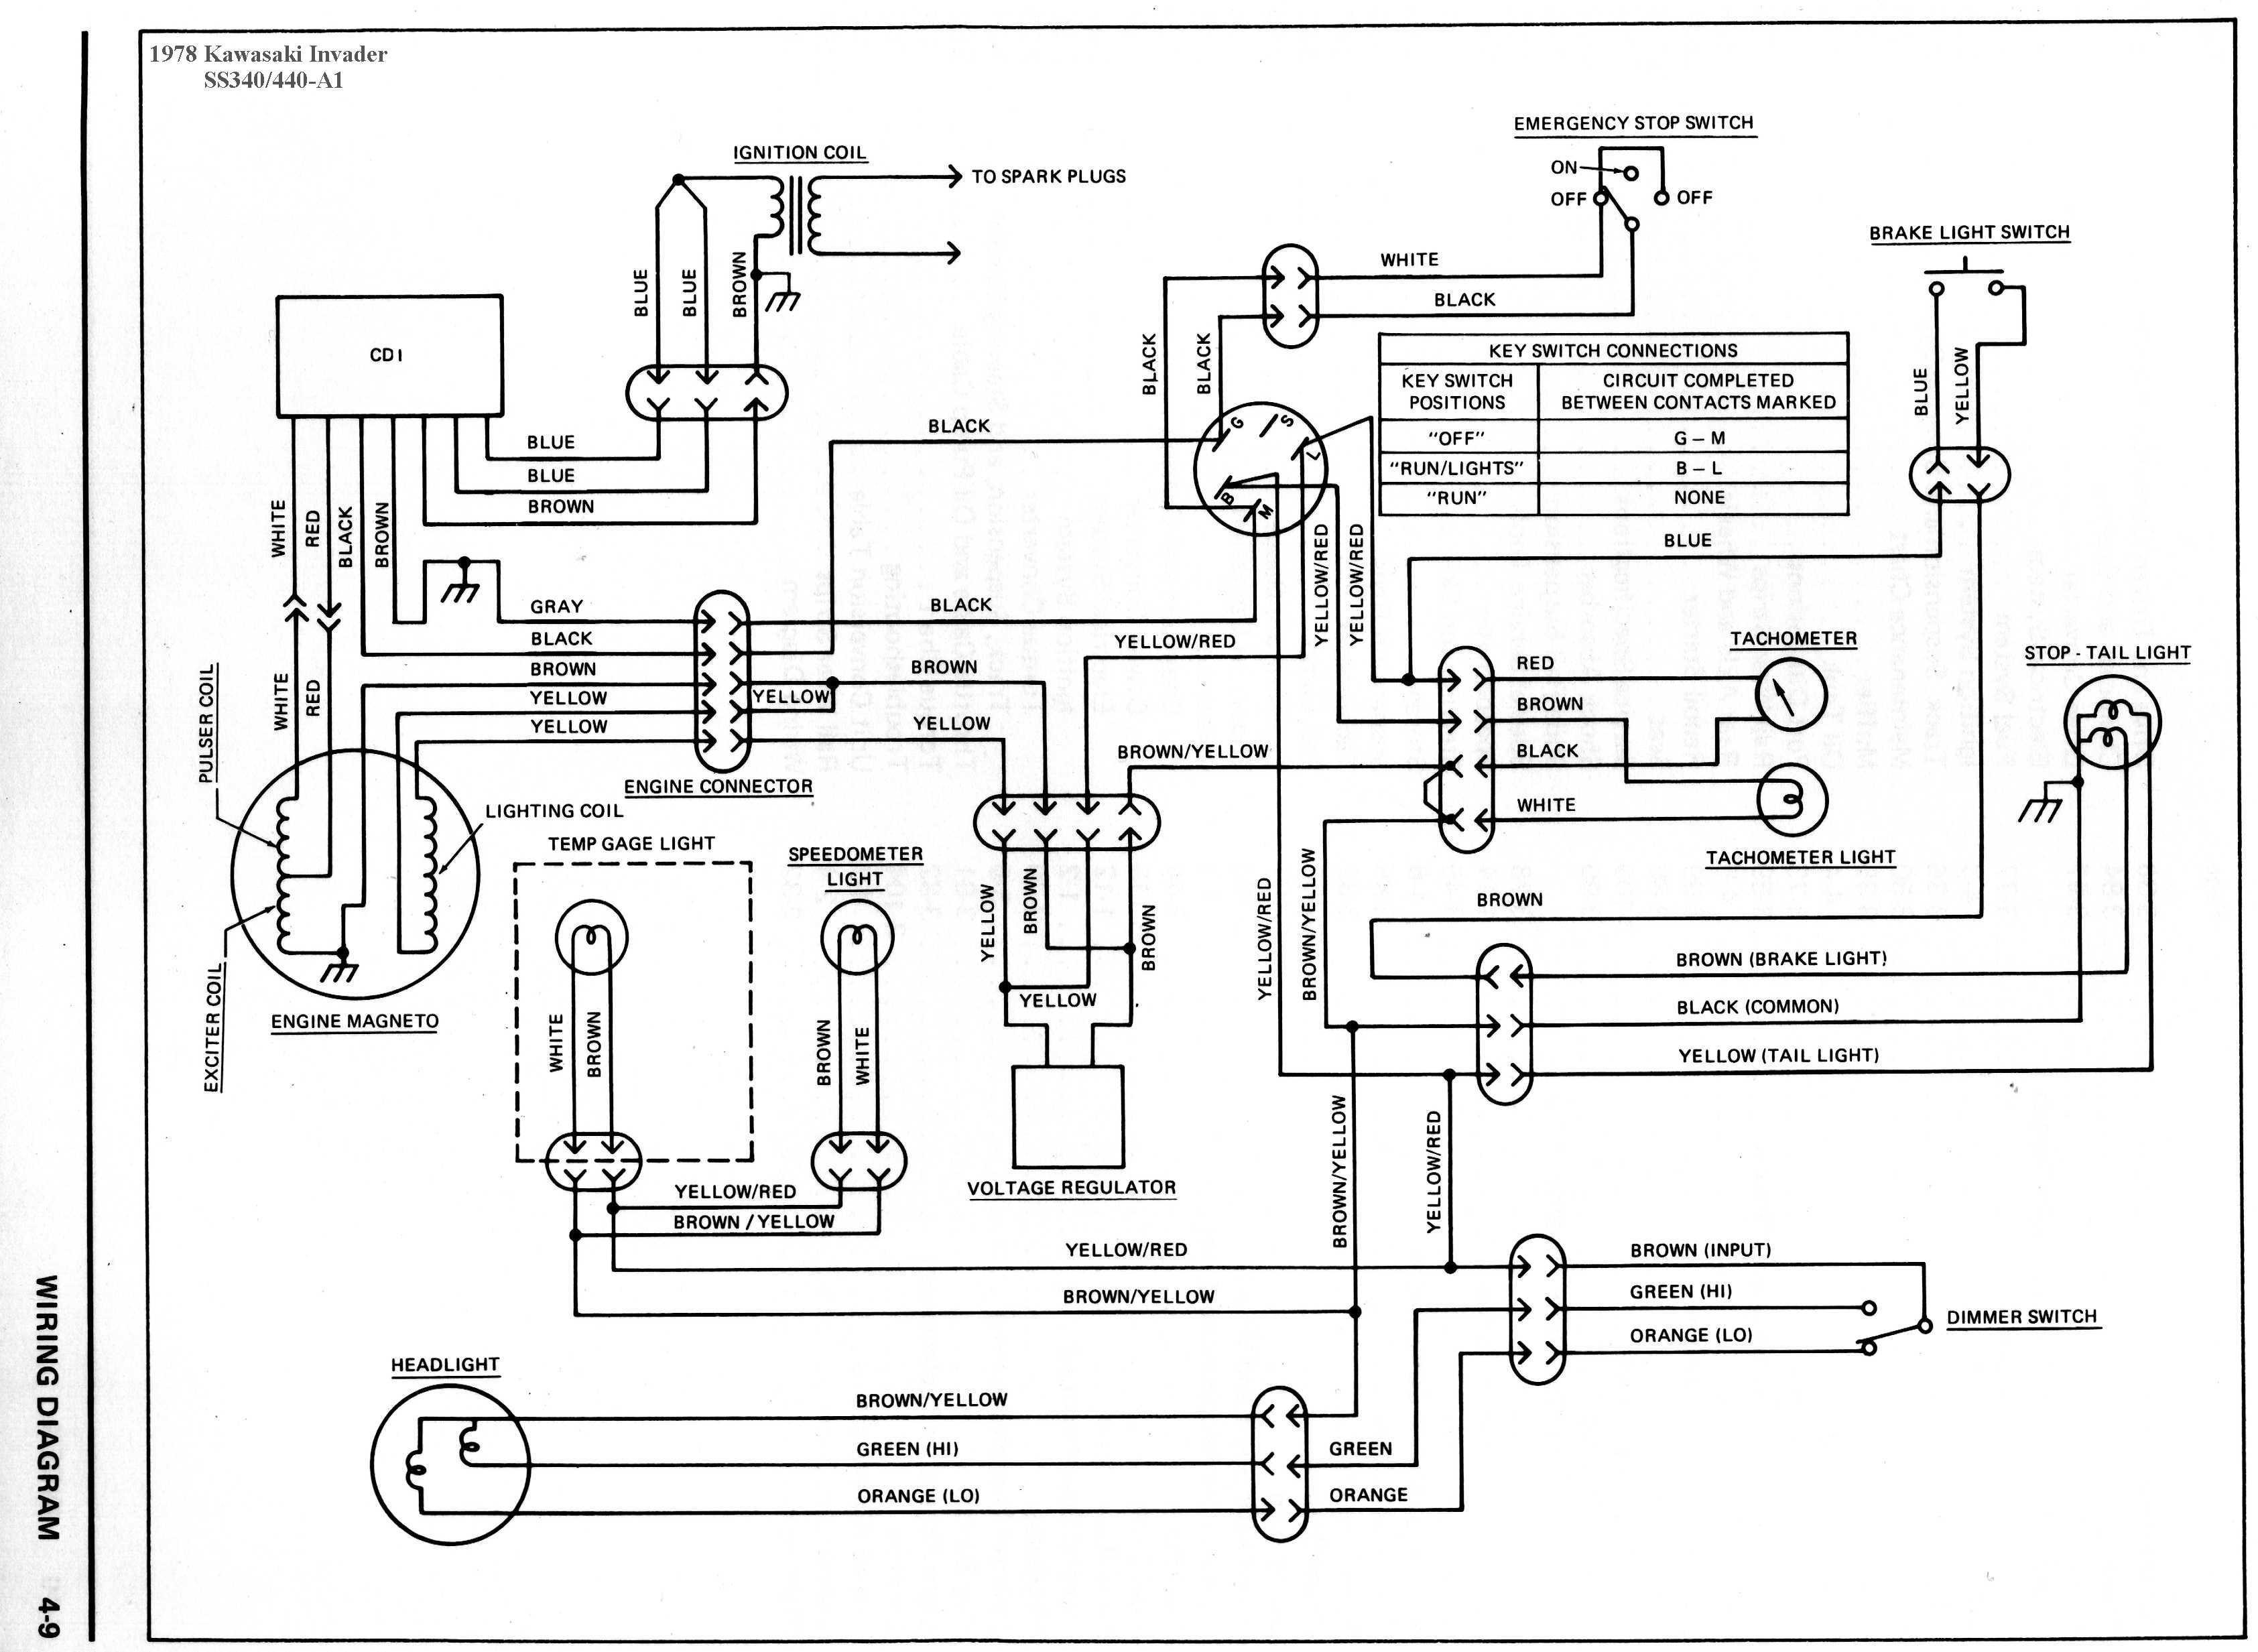 Wiring Diagram For Kawasaki Mule 3010 - Wiring Diagram Best on